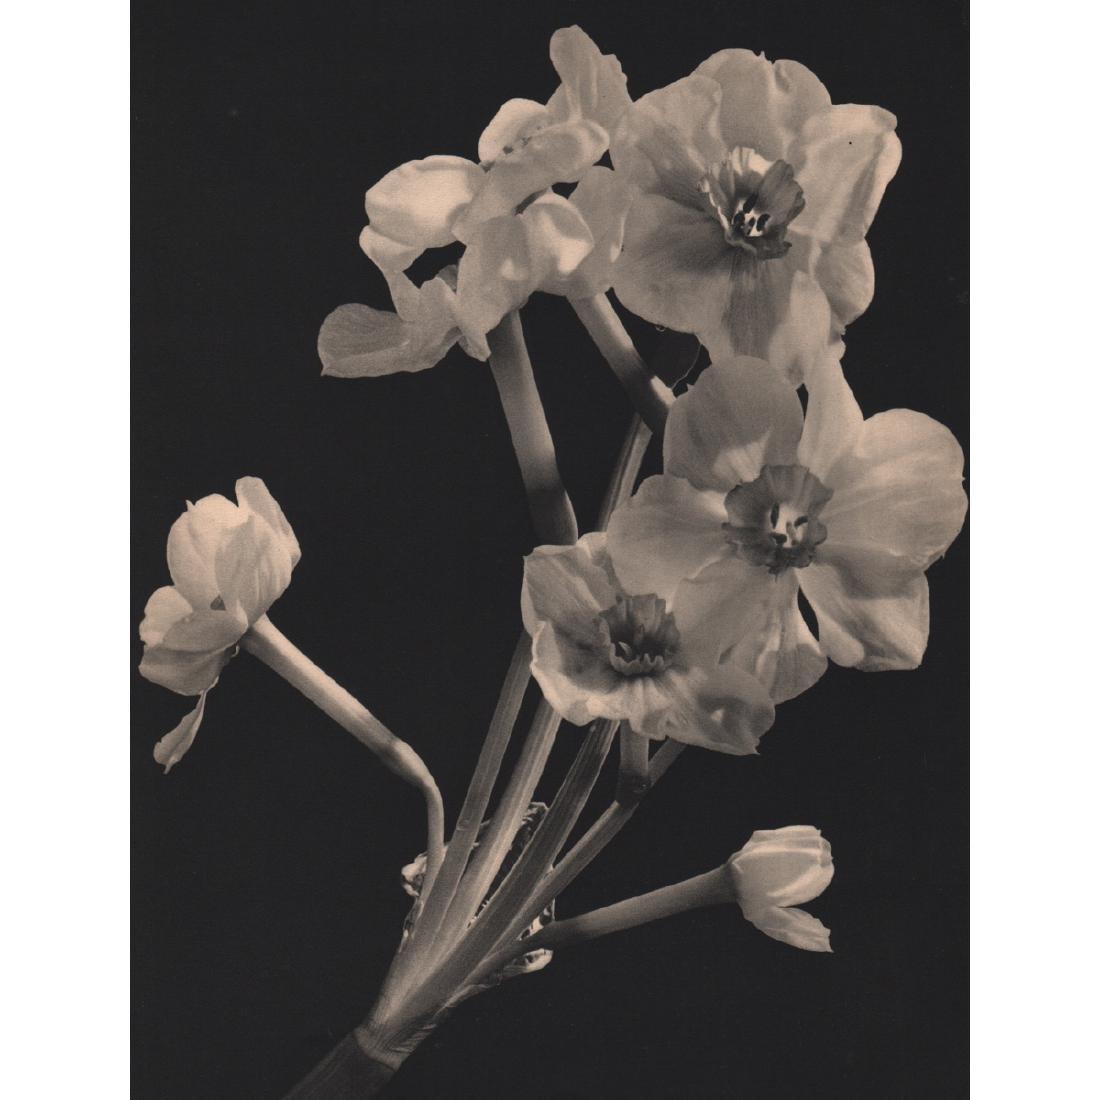 WILLEM VAN DE POLL - White Narcissus